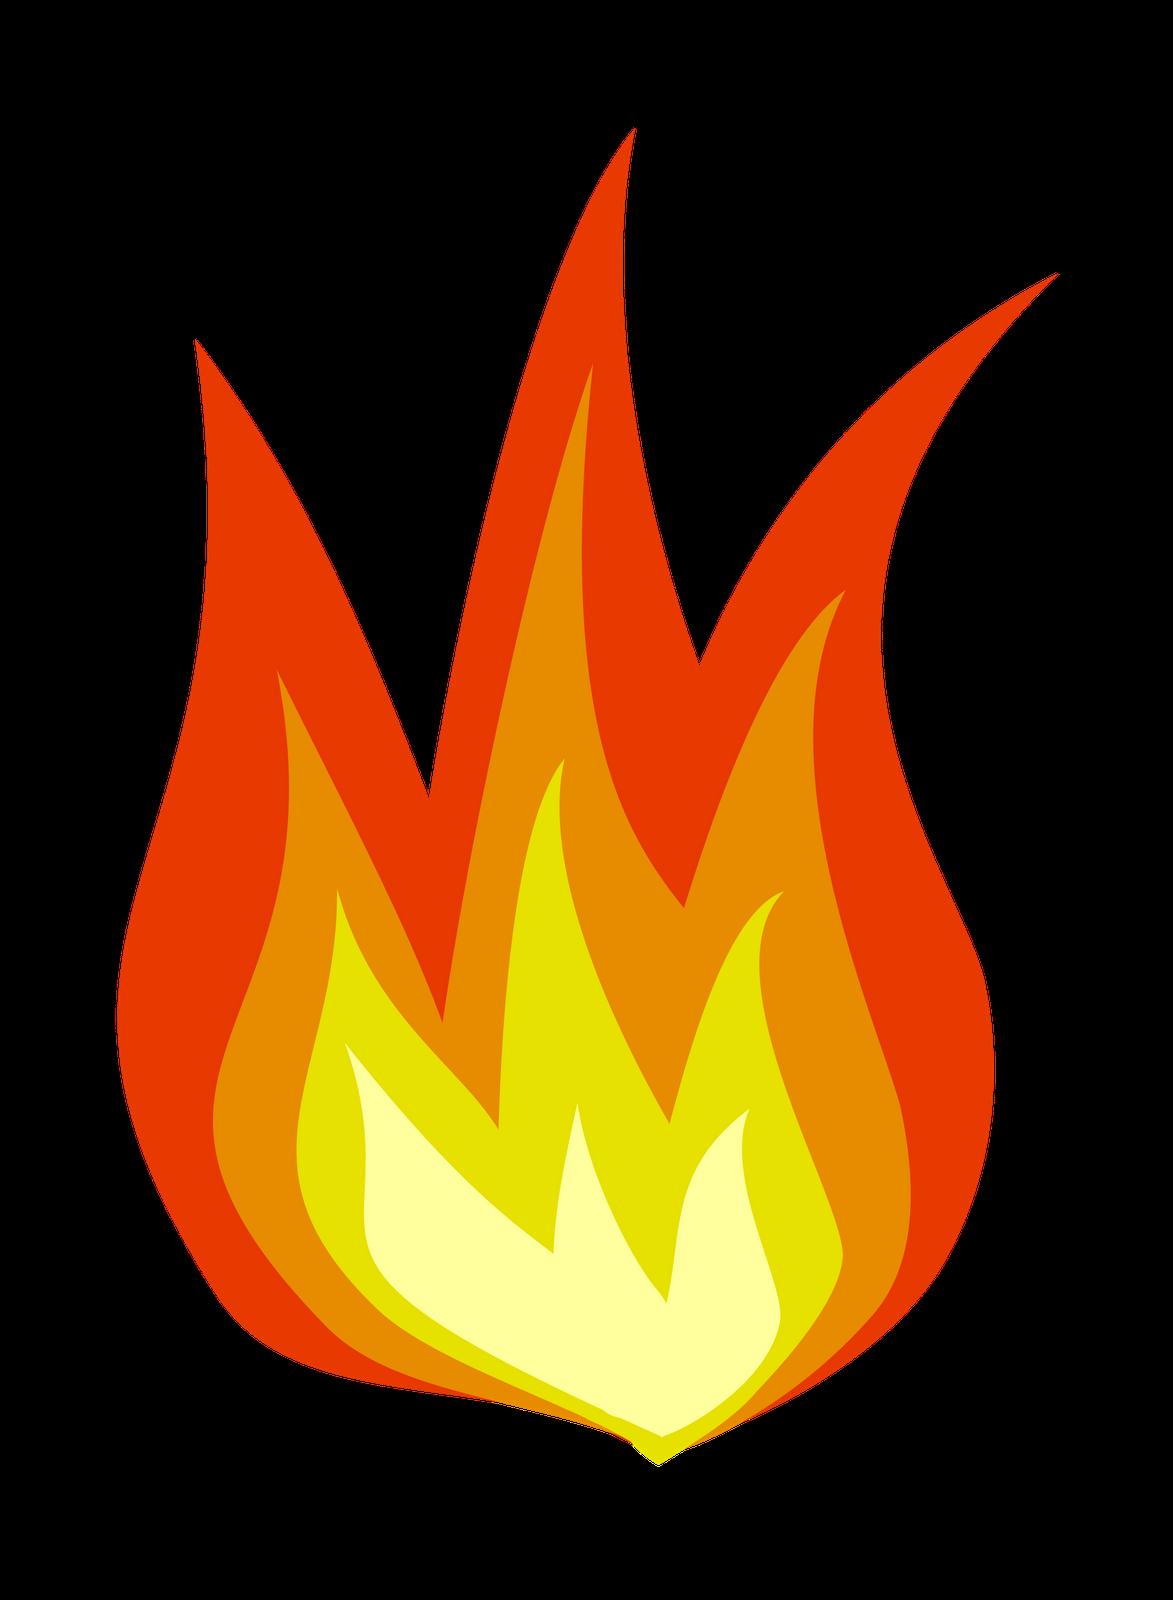 The Girl S Anger Was Burning Like Hot Fire Fire Icons Holy Spirit Art Holy Spirit